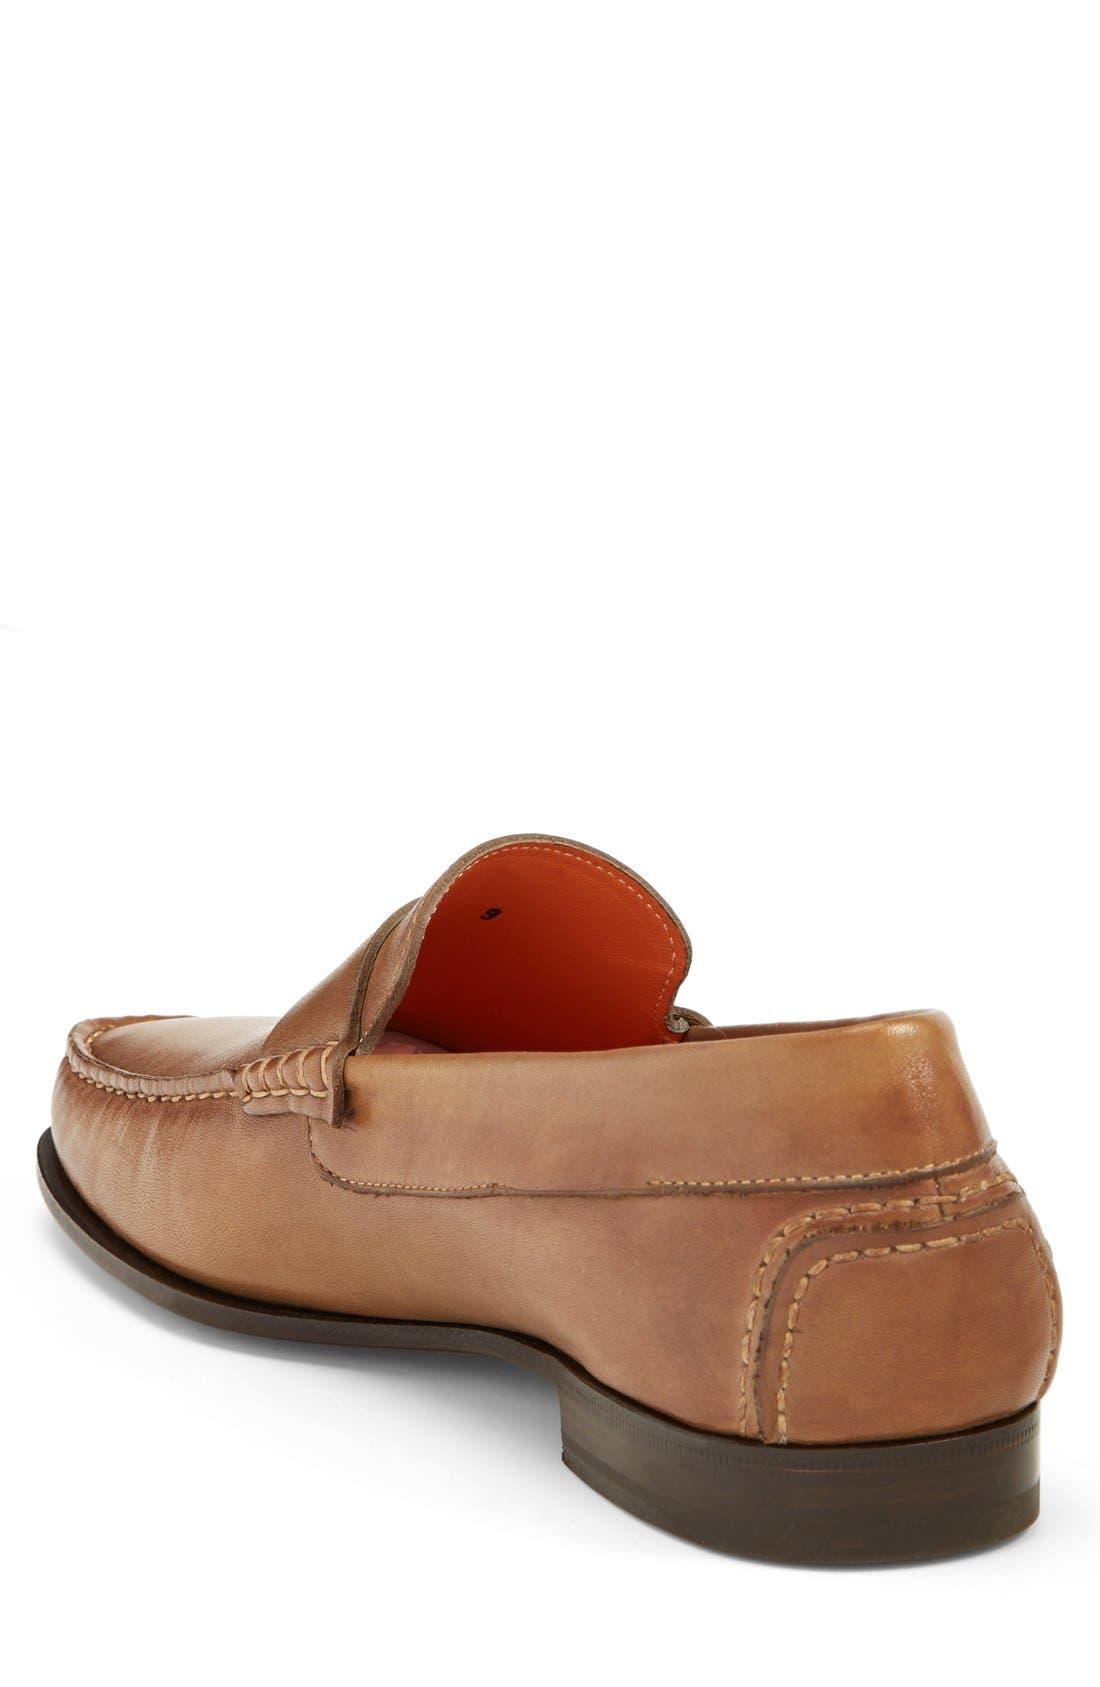 SANTONI,                             'Turner' Leather Penny Loafer,                             Alternate thumbnail 2, color,                             270